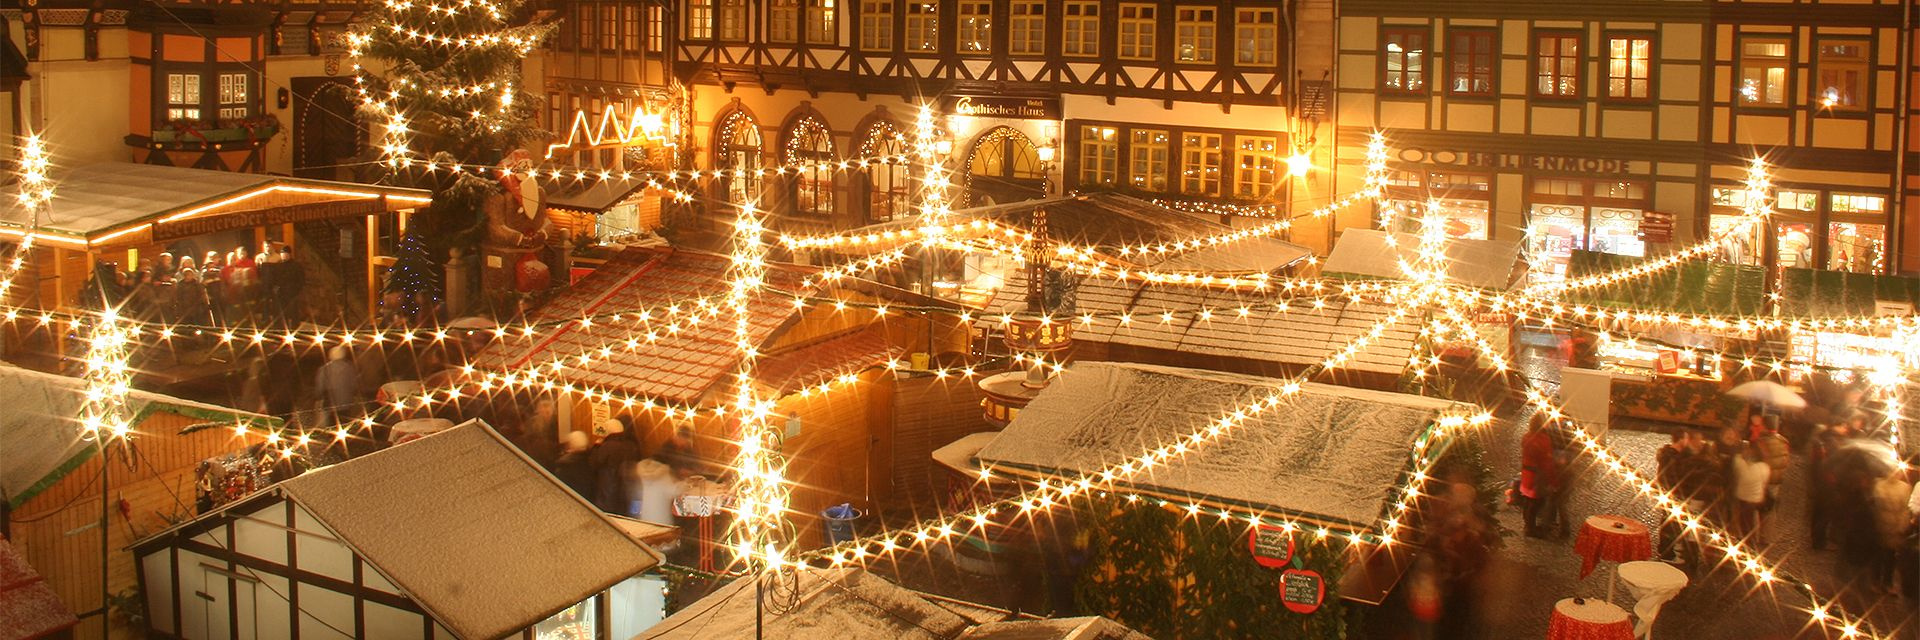 julemarked i wernigerode